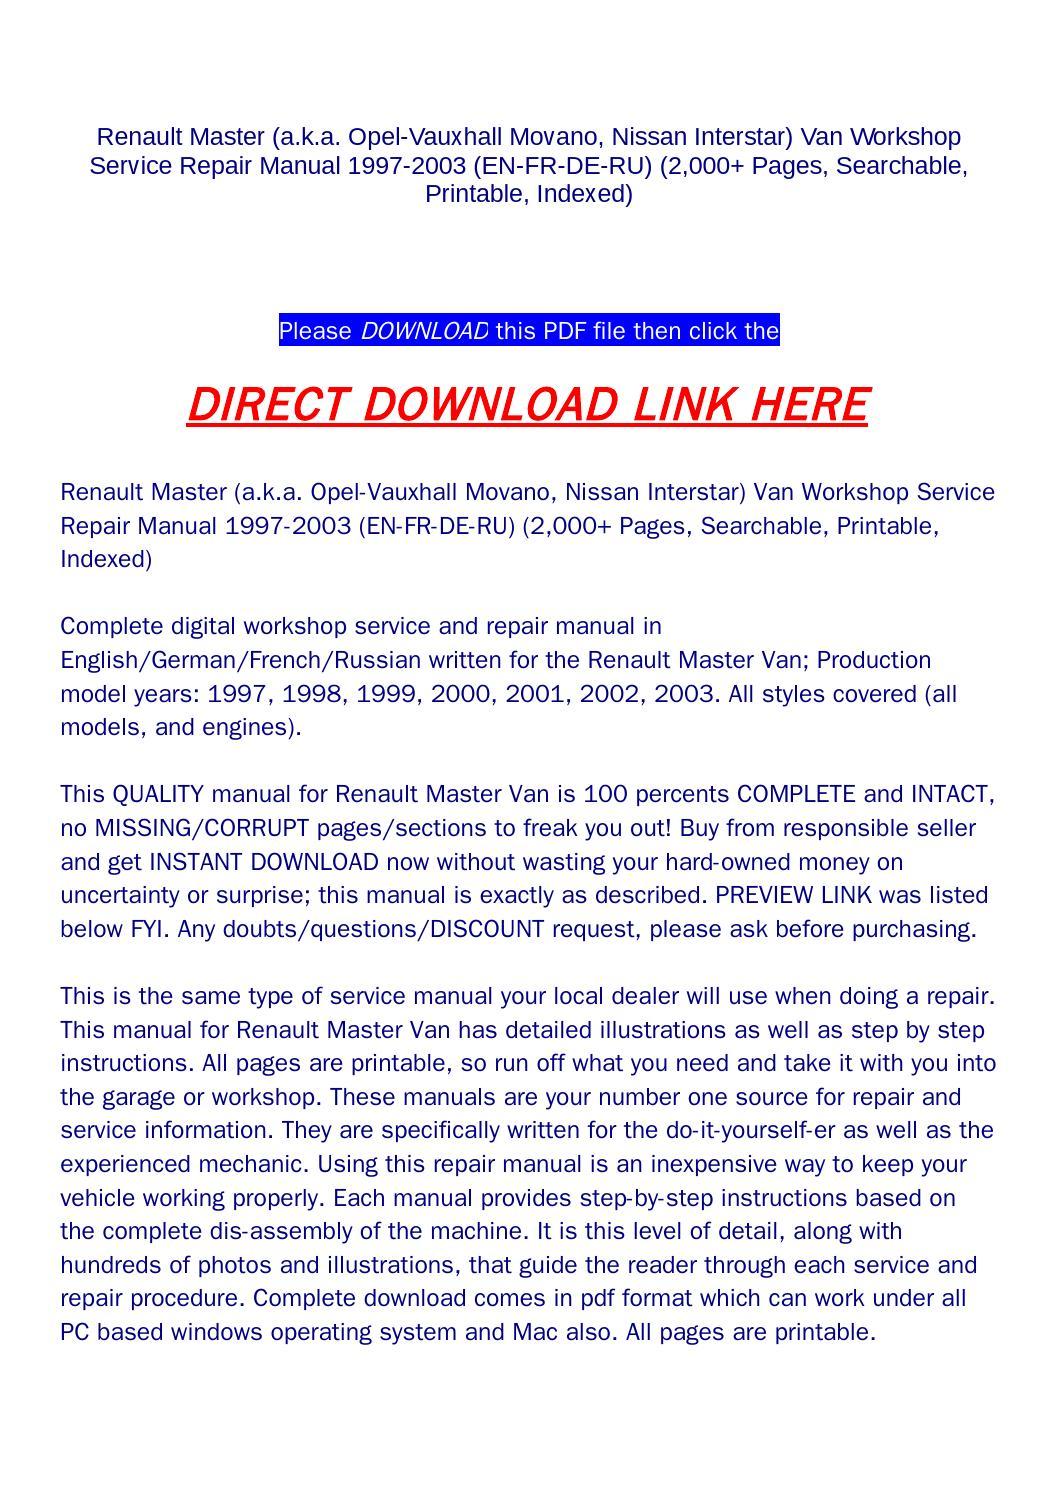 nissan interstar wiring diagram online wiring diagramnissan interstar wiring  diagram schematic diagramrenault master (a k a opel